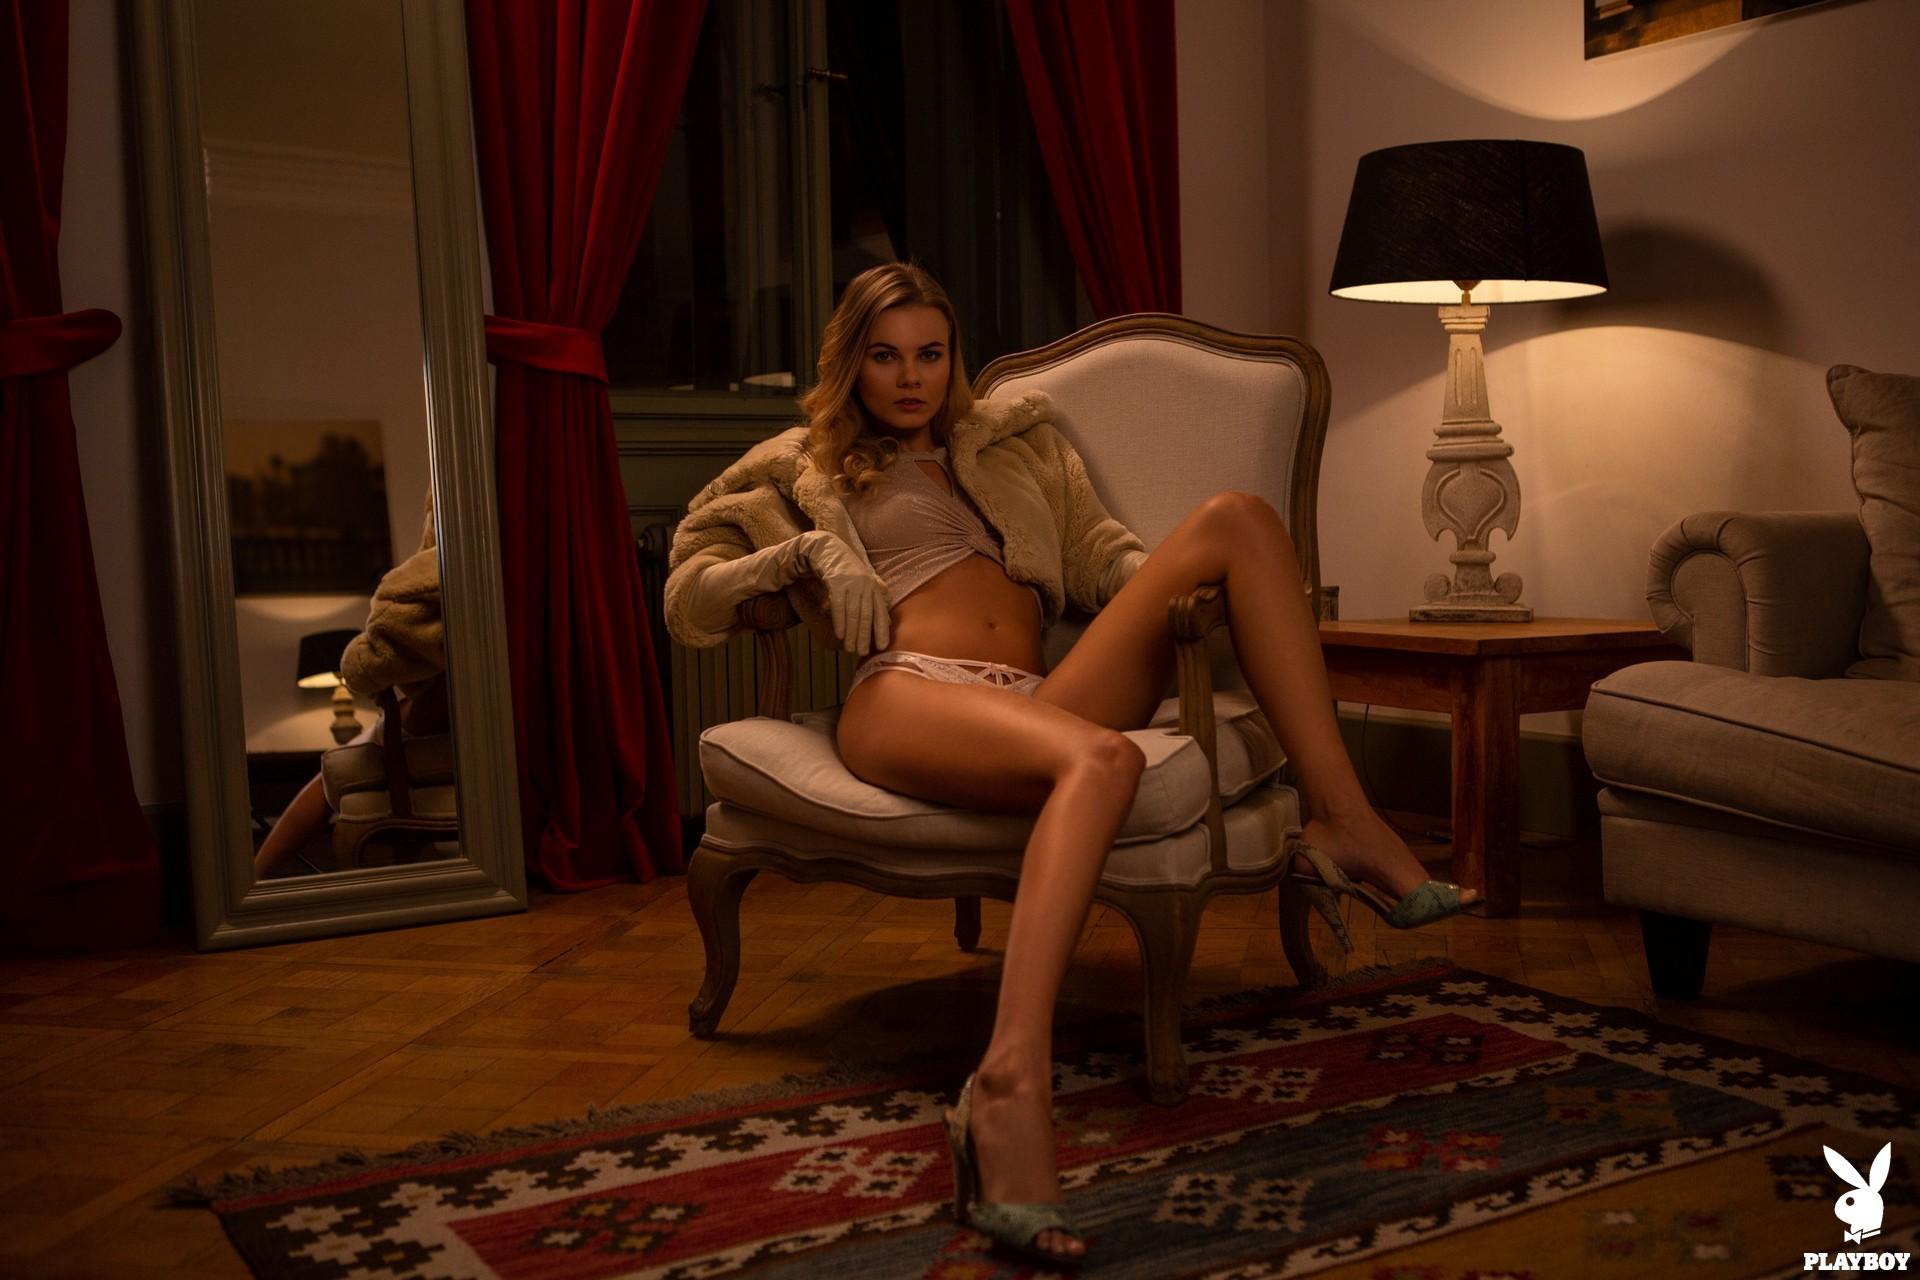 Kate Jones in Exquisite Allure - Playboy Plus 2